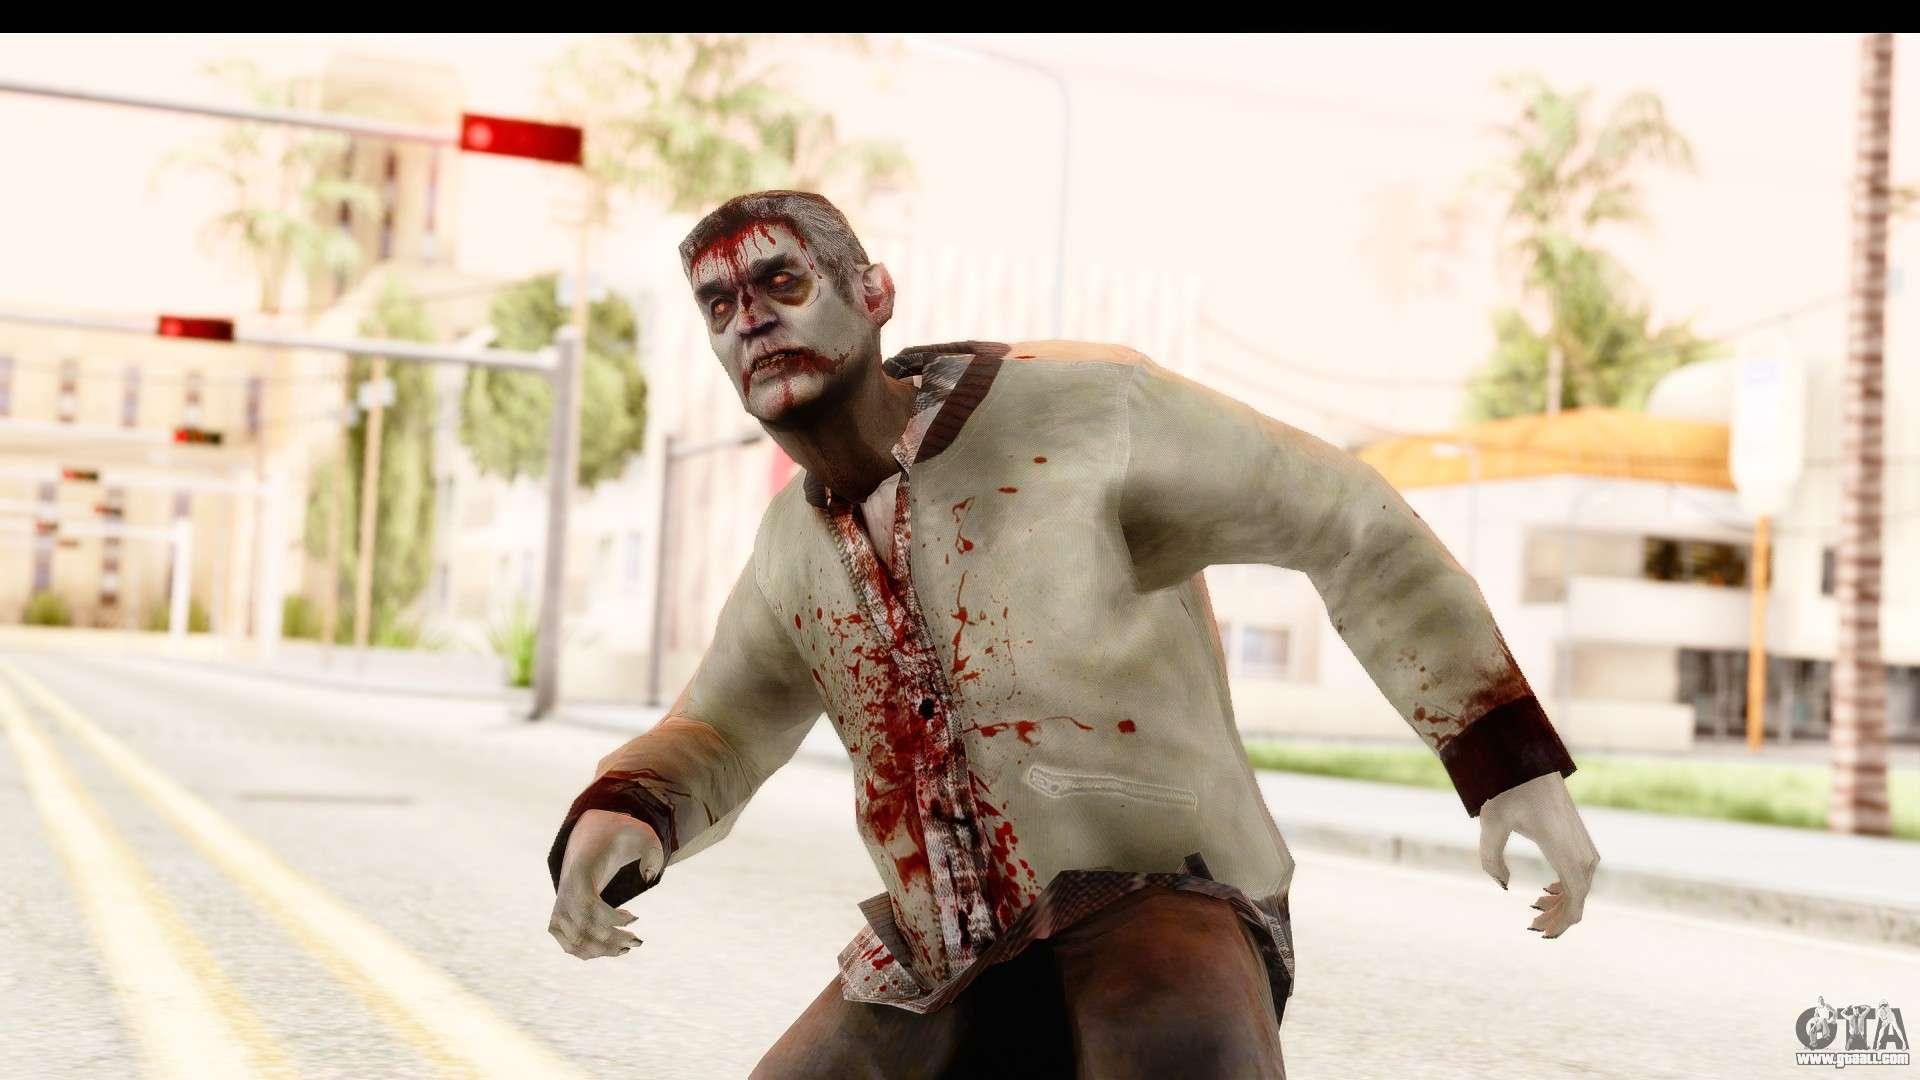 zombie hands left - photo #34